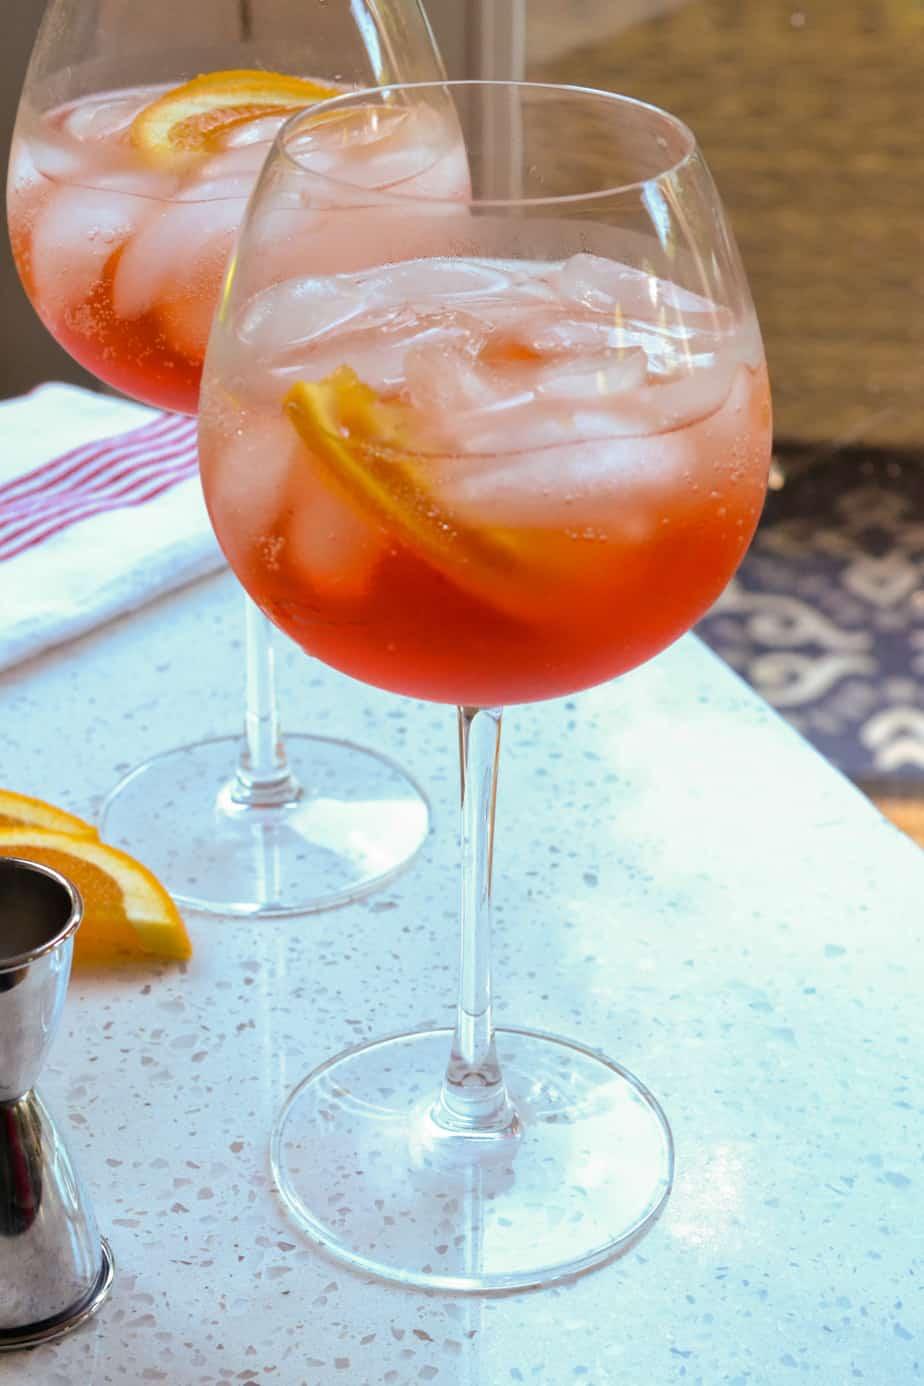 Aperol spritz in big bowl wine glasses with orange slices.